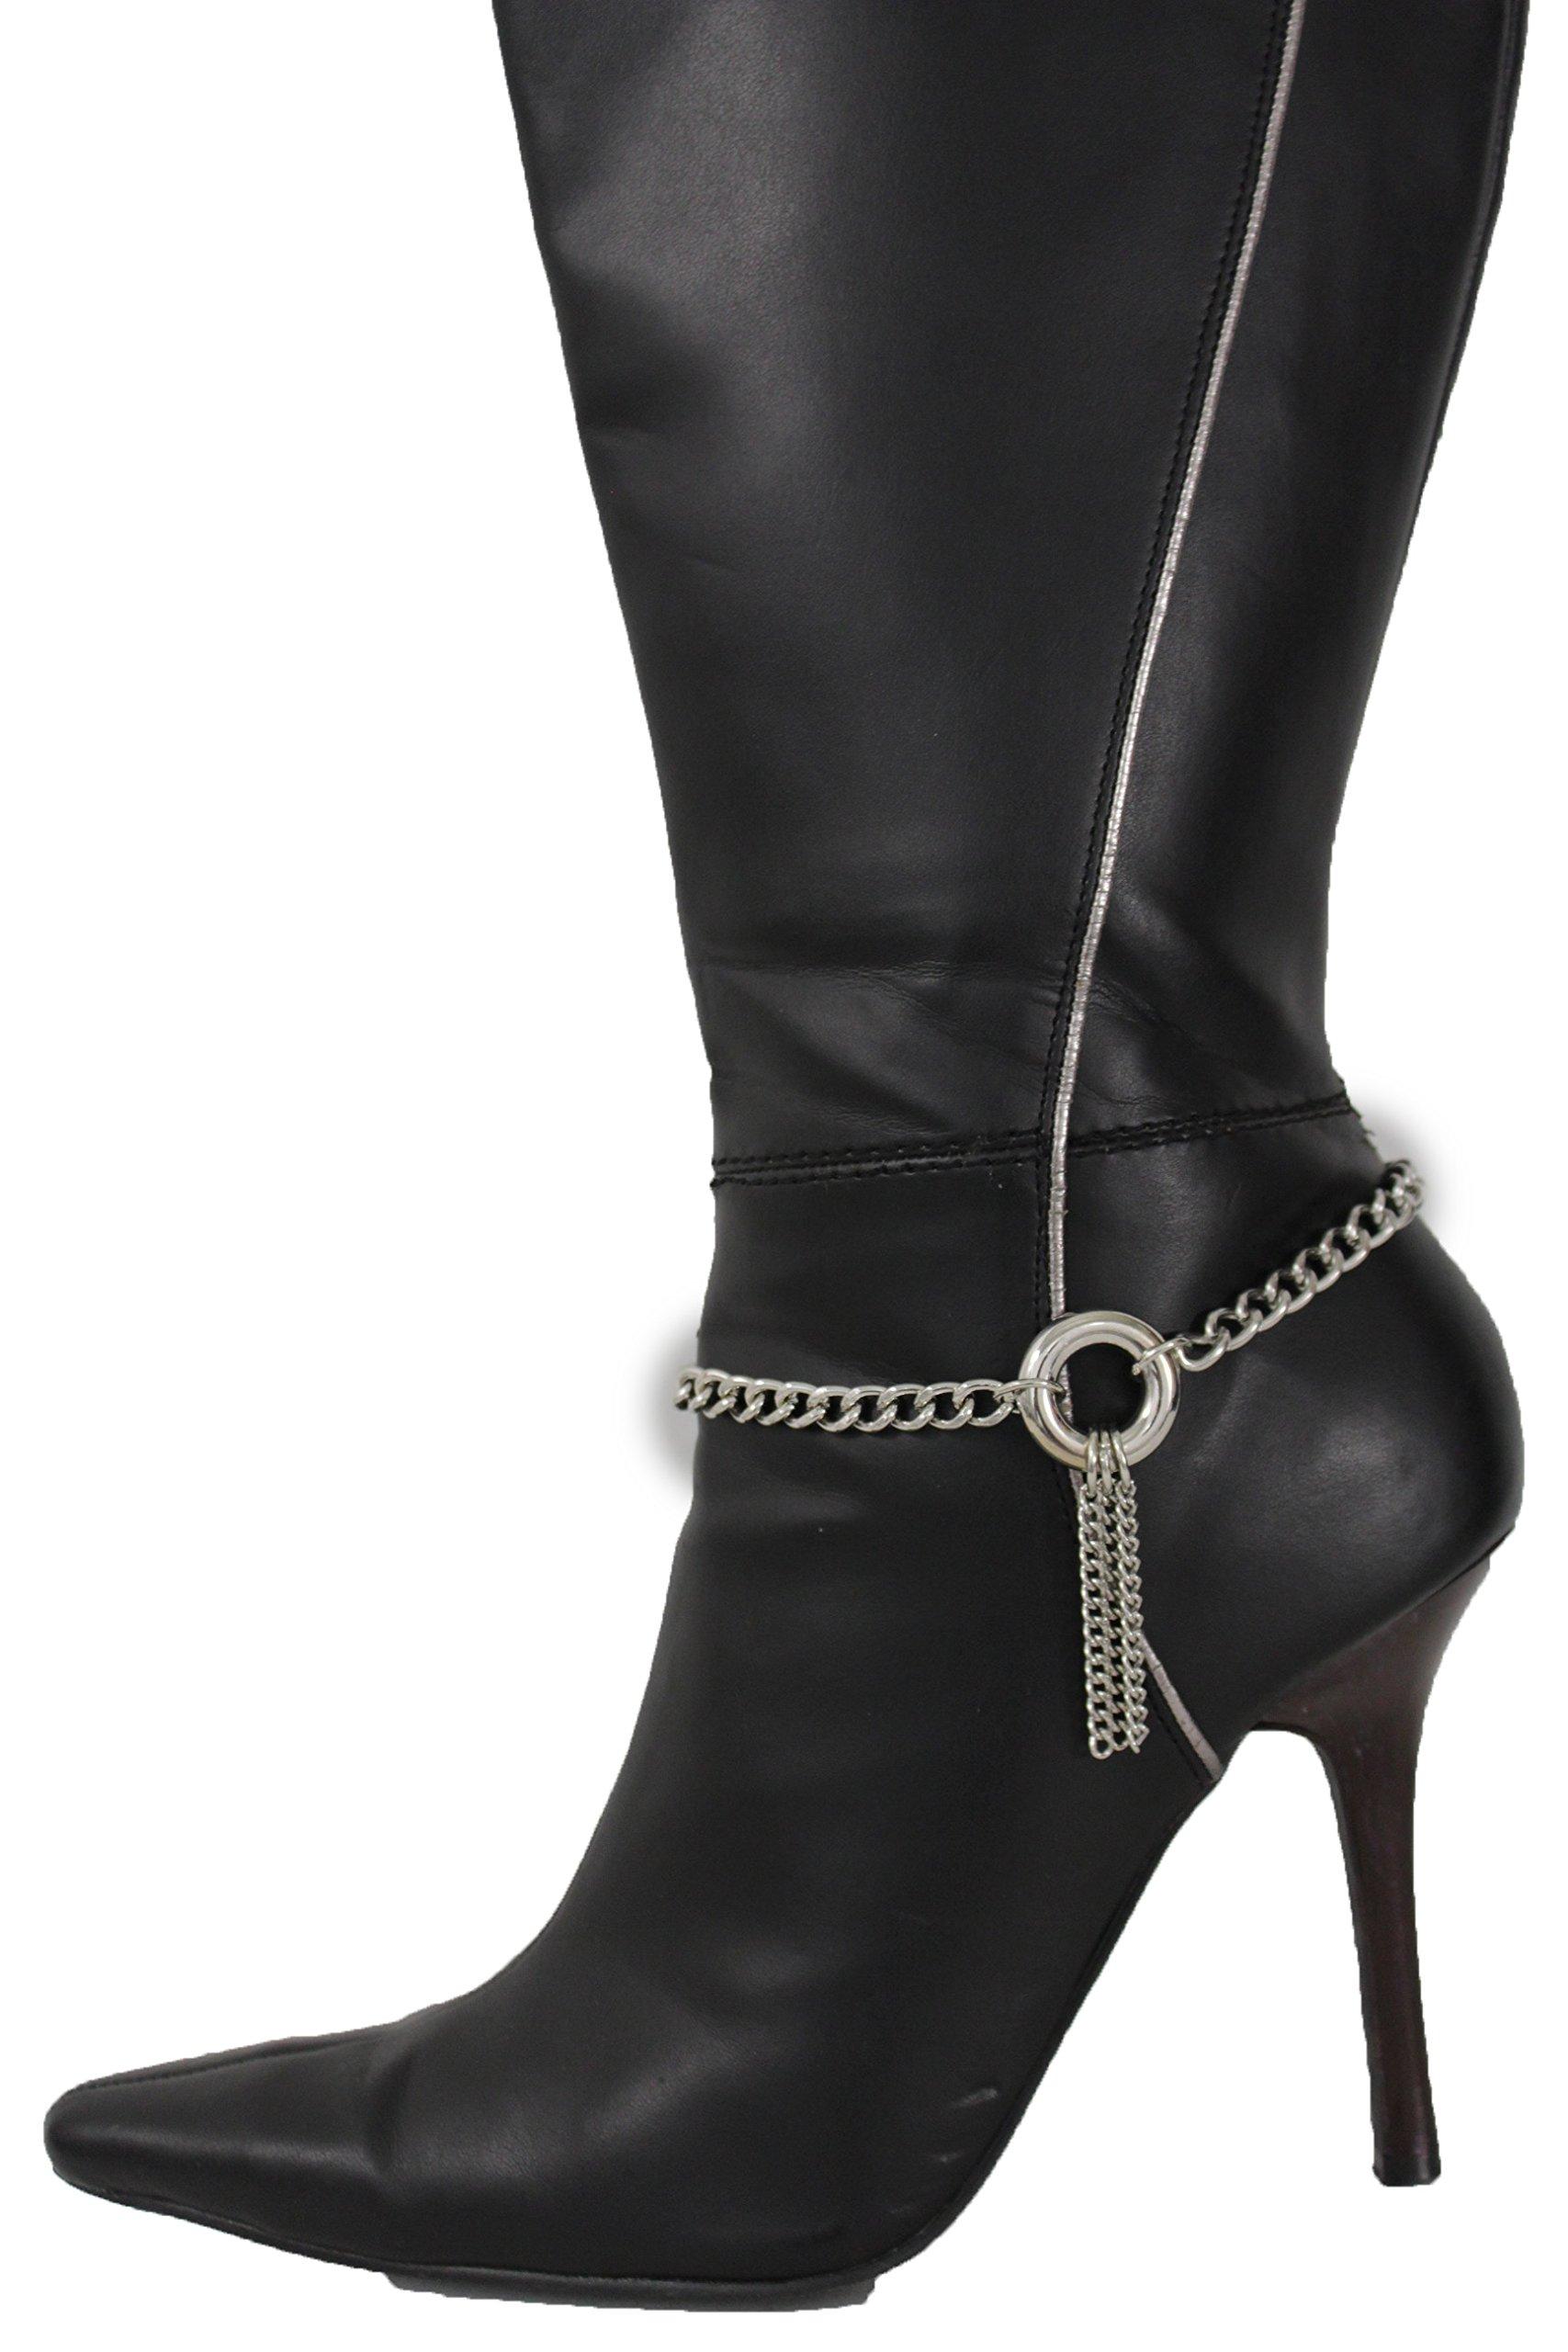 TFJ Women Western Fashion Jewelry Boot Chain Bracelet Silver Metal Ring Fringes Bling Shoe Charm